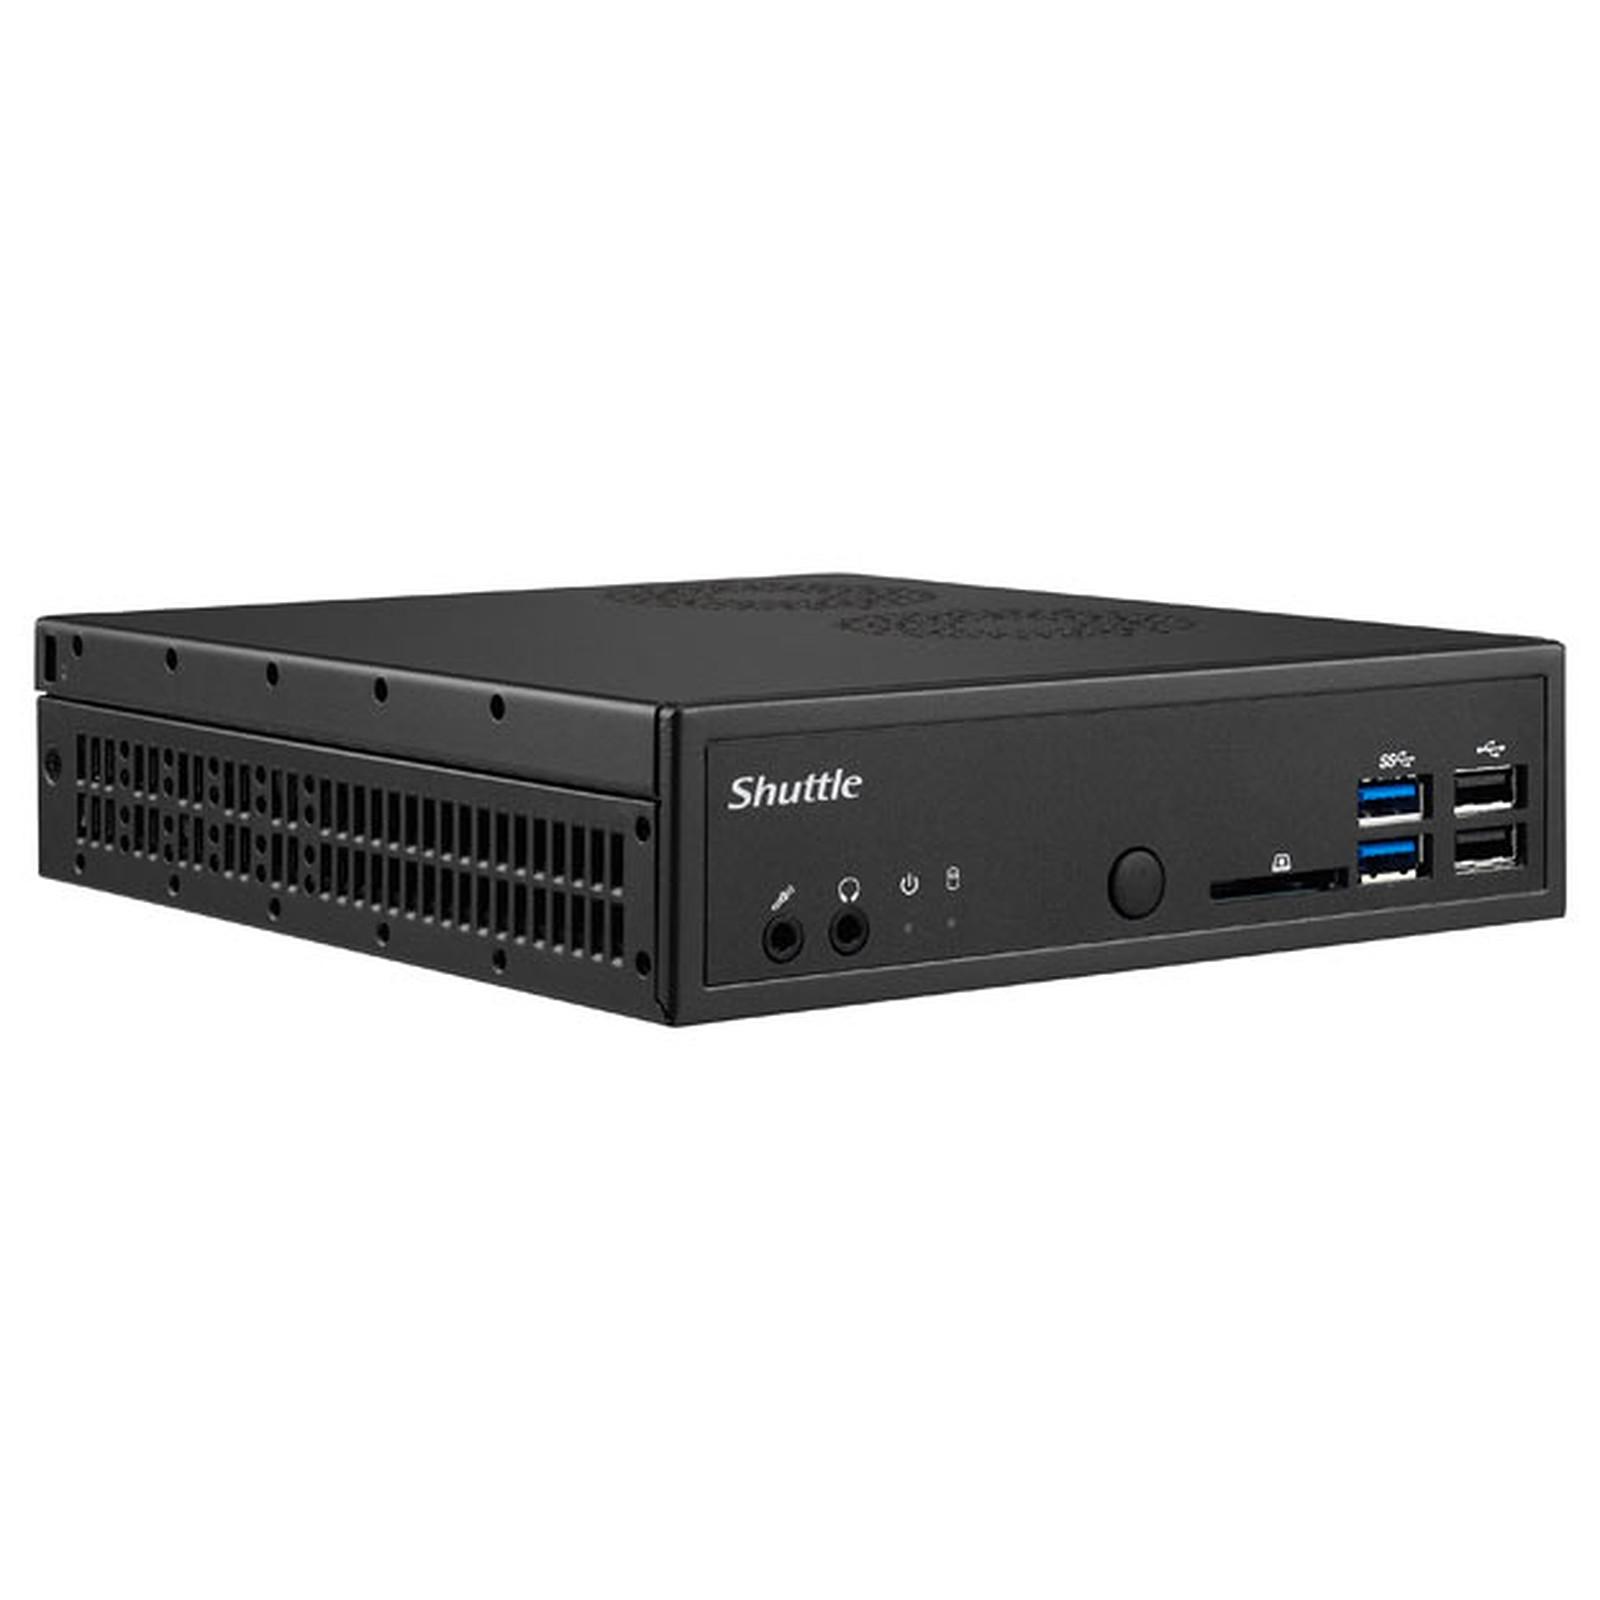 Shuttle DQ170 (Intel Q170 Express)